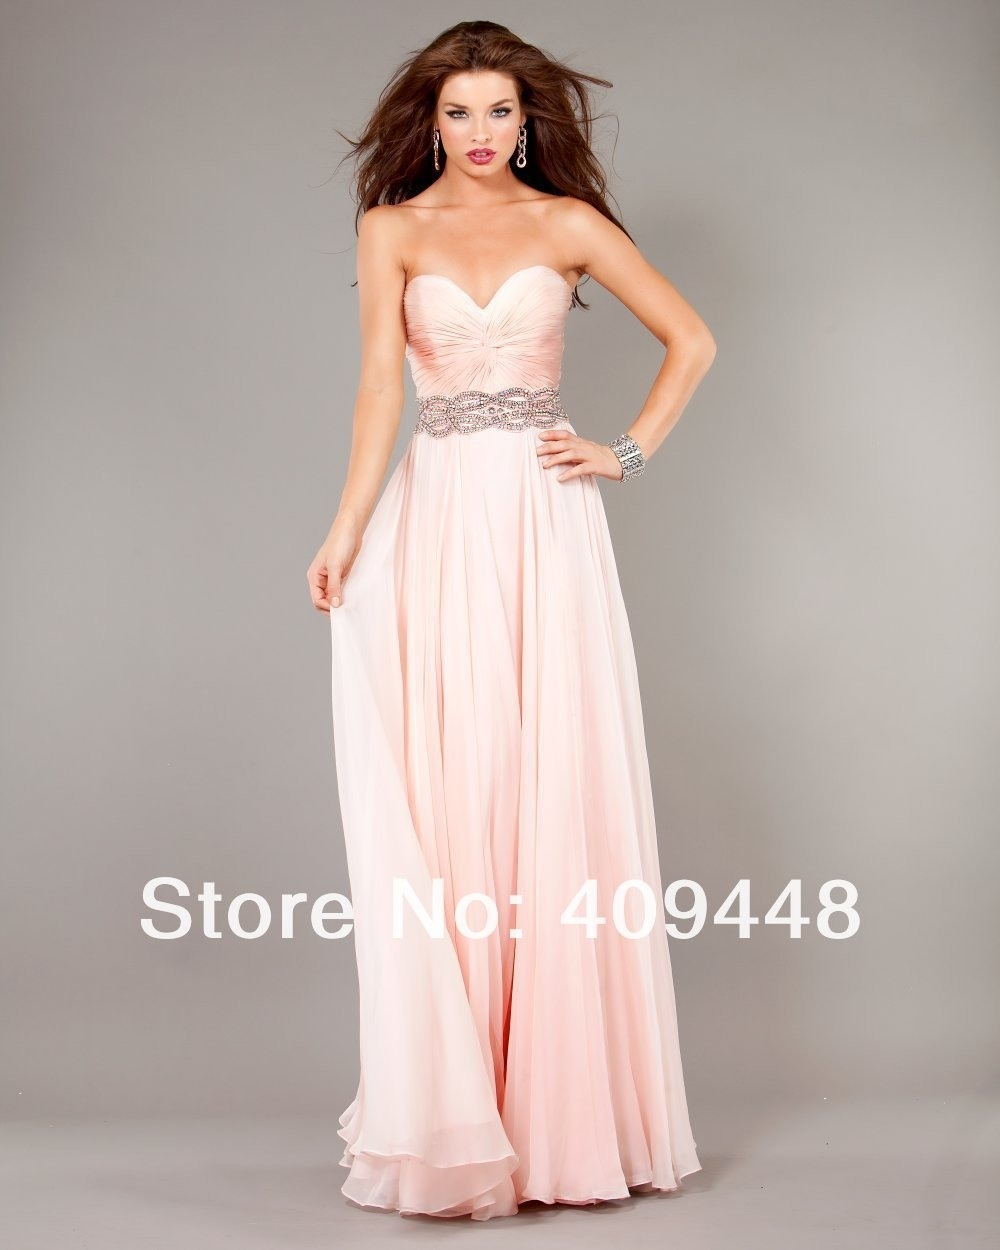 Abend Schön Kleid Rosa Lang Spezialgebiet17 Top Kleid Rosa Lang Galerie